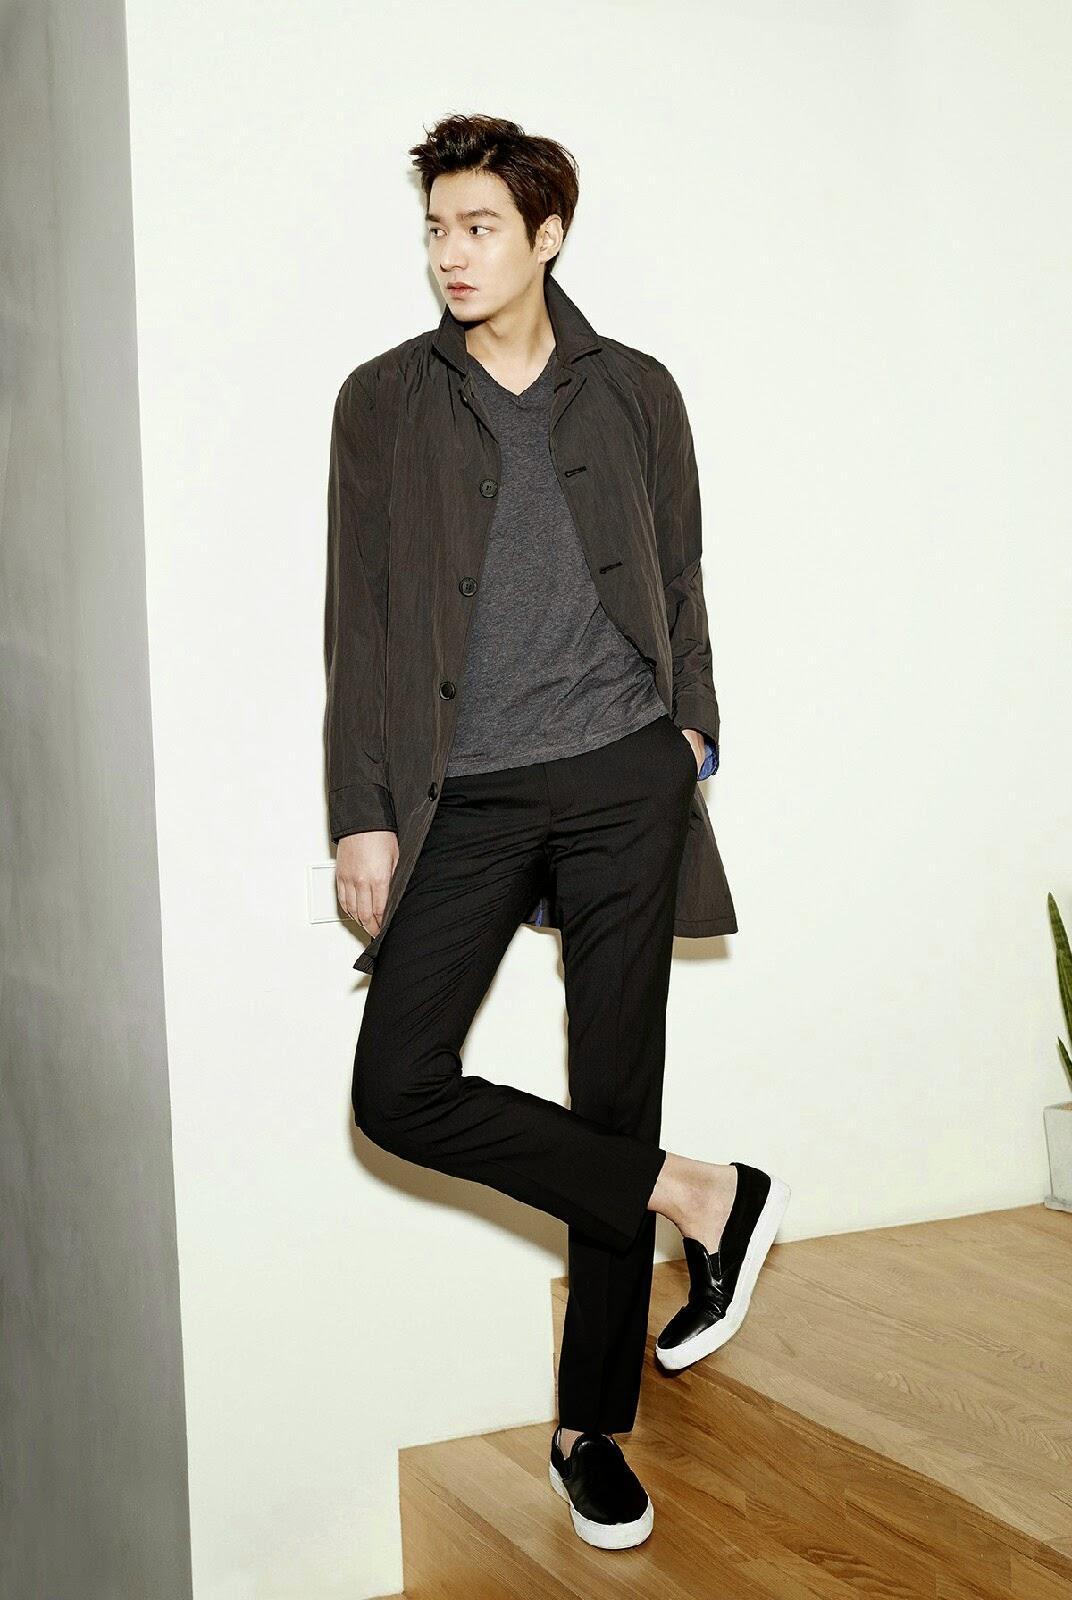 The Imaginary World Of Monika Lee Min Ho For Tngt Fashion